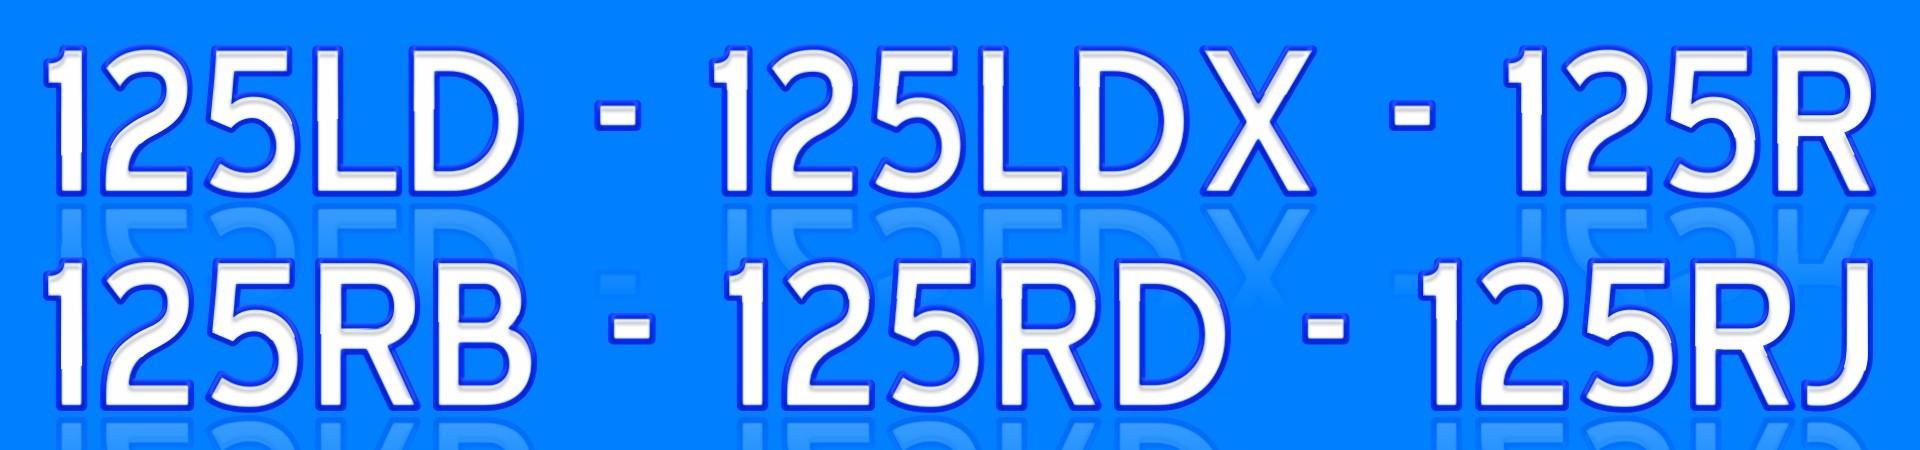 REPUESTOS para Desbrozadora HUSQVARNA 124R 125R 128R 132R